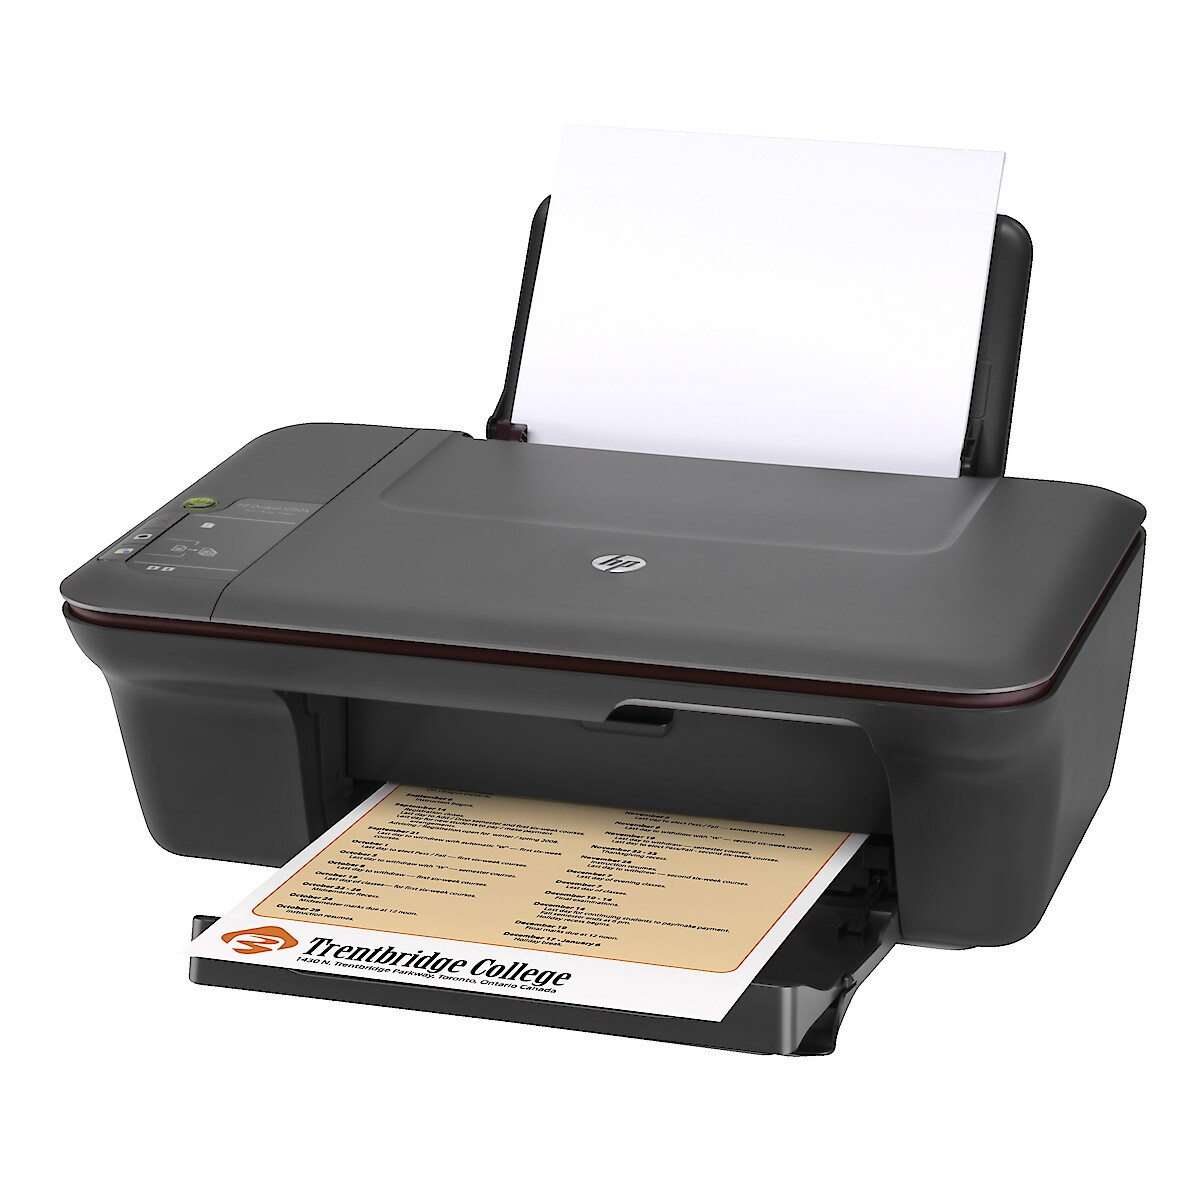 HP Deskjet 1050A All-In-One Inkjet Printer